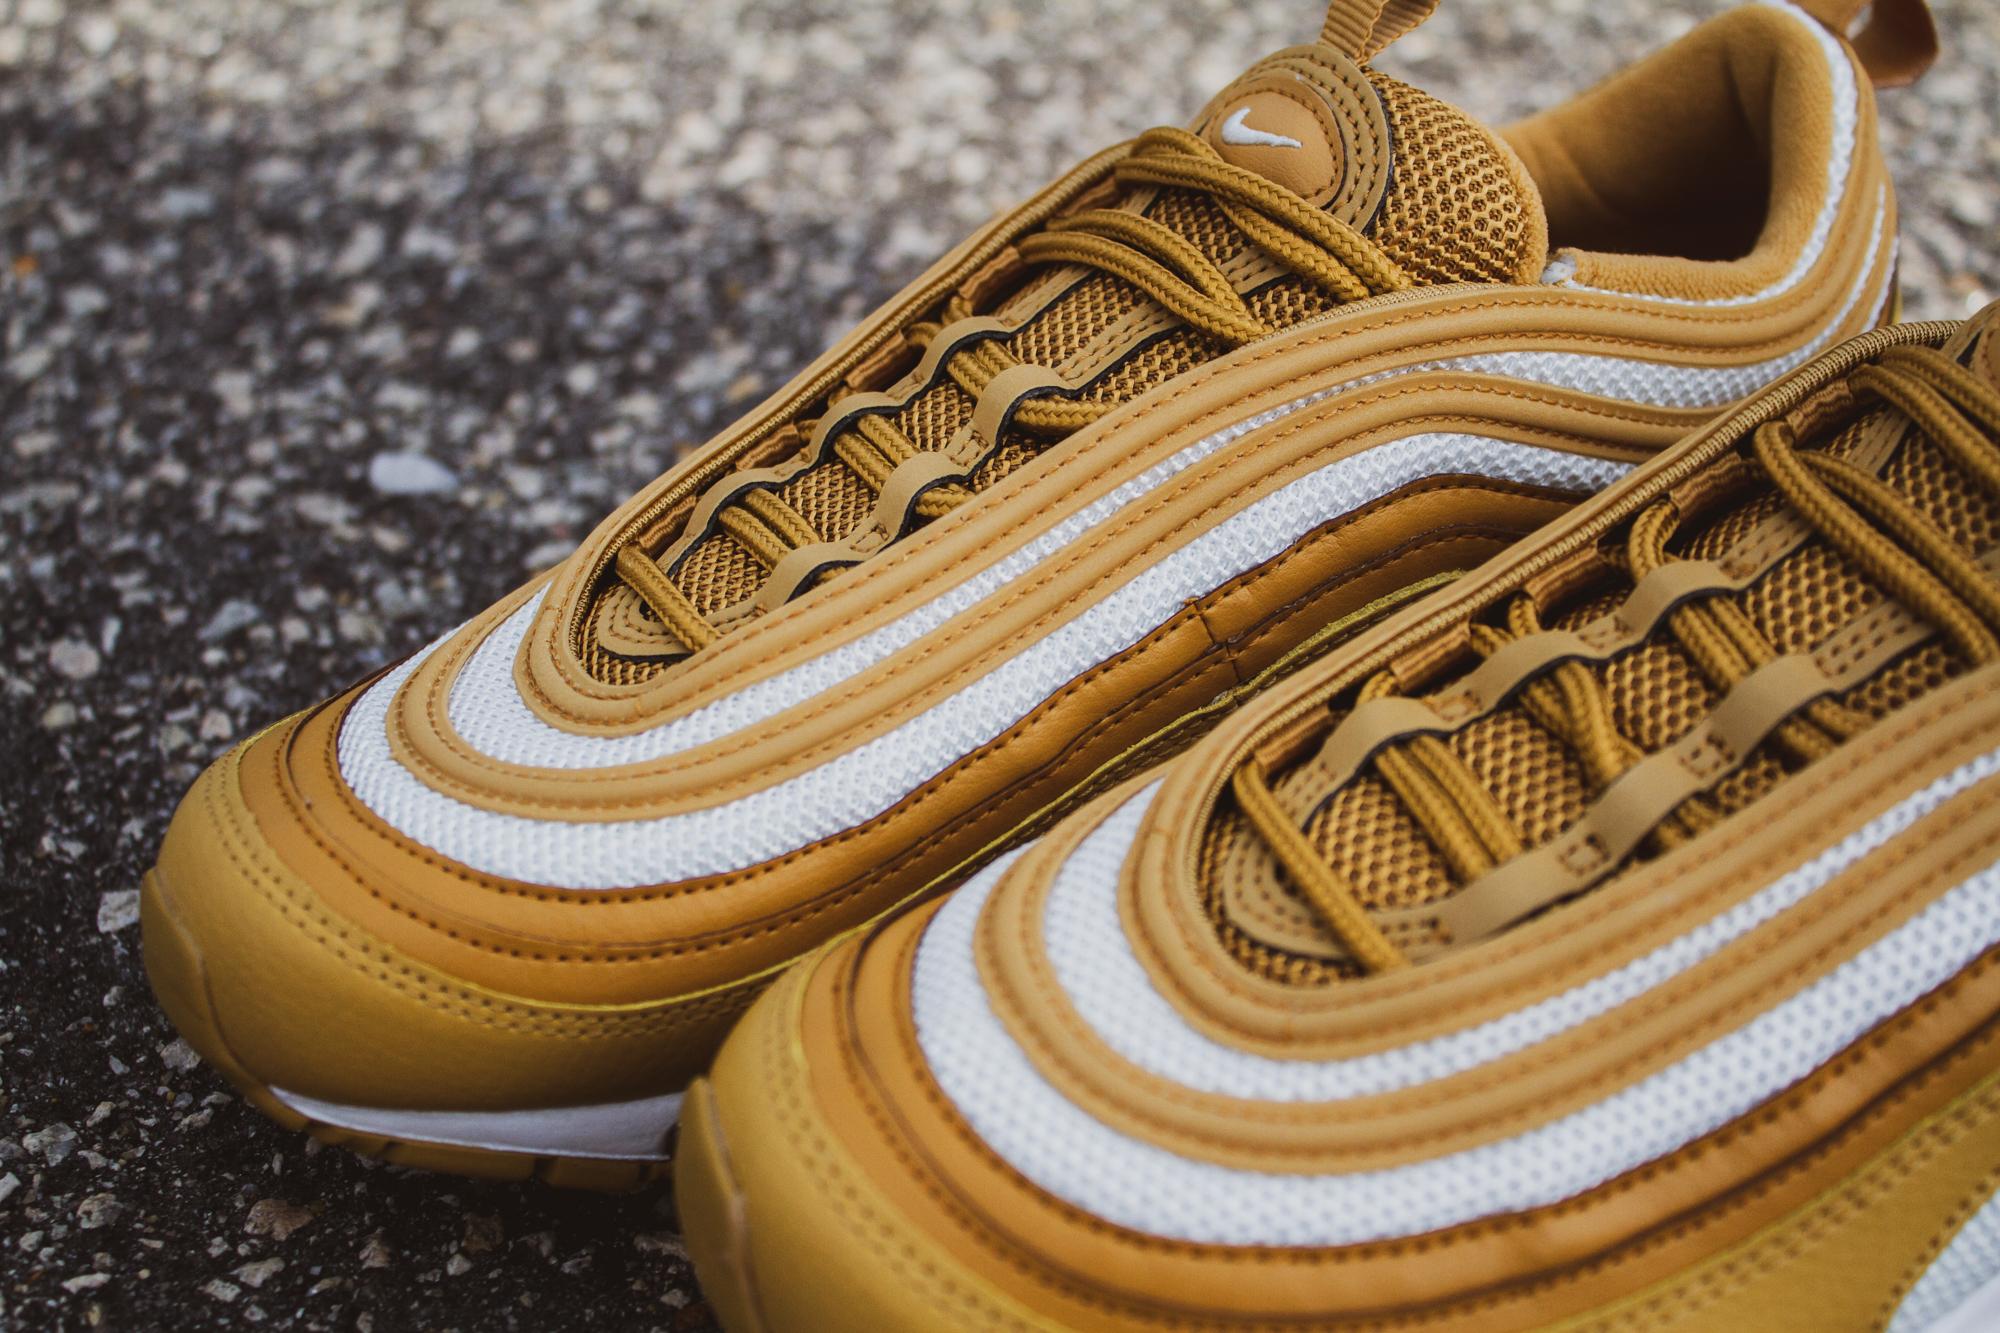 NLS_shoes-10.jpg